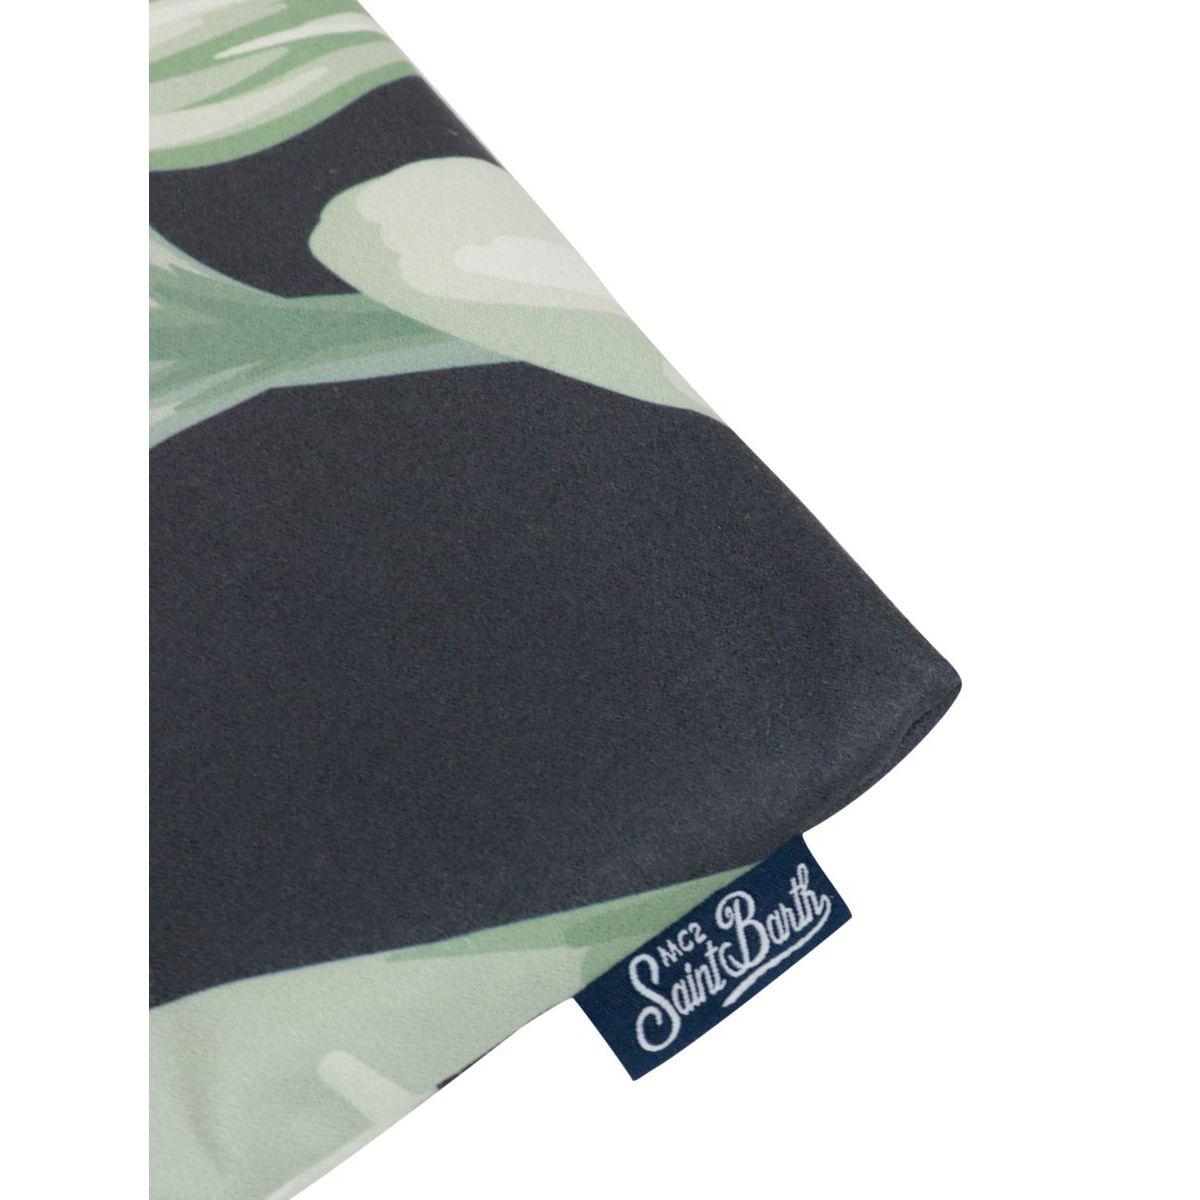 Microfiber Aidan beach towel Blue fantasy MC2 Saint Barth